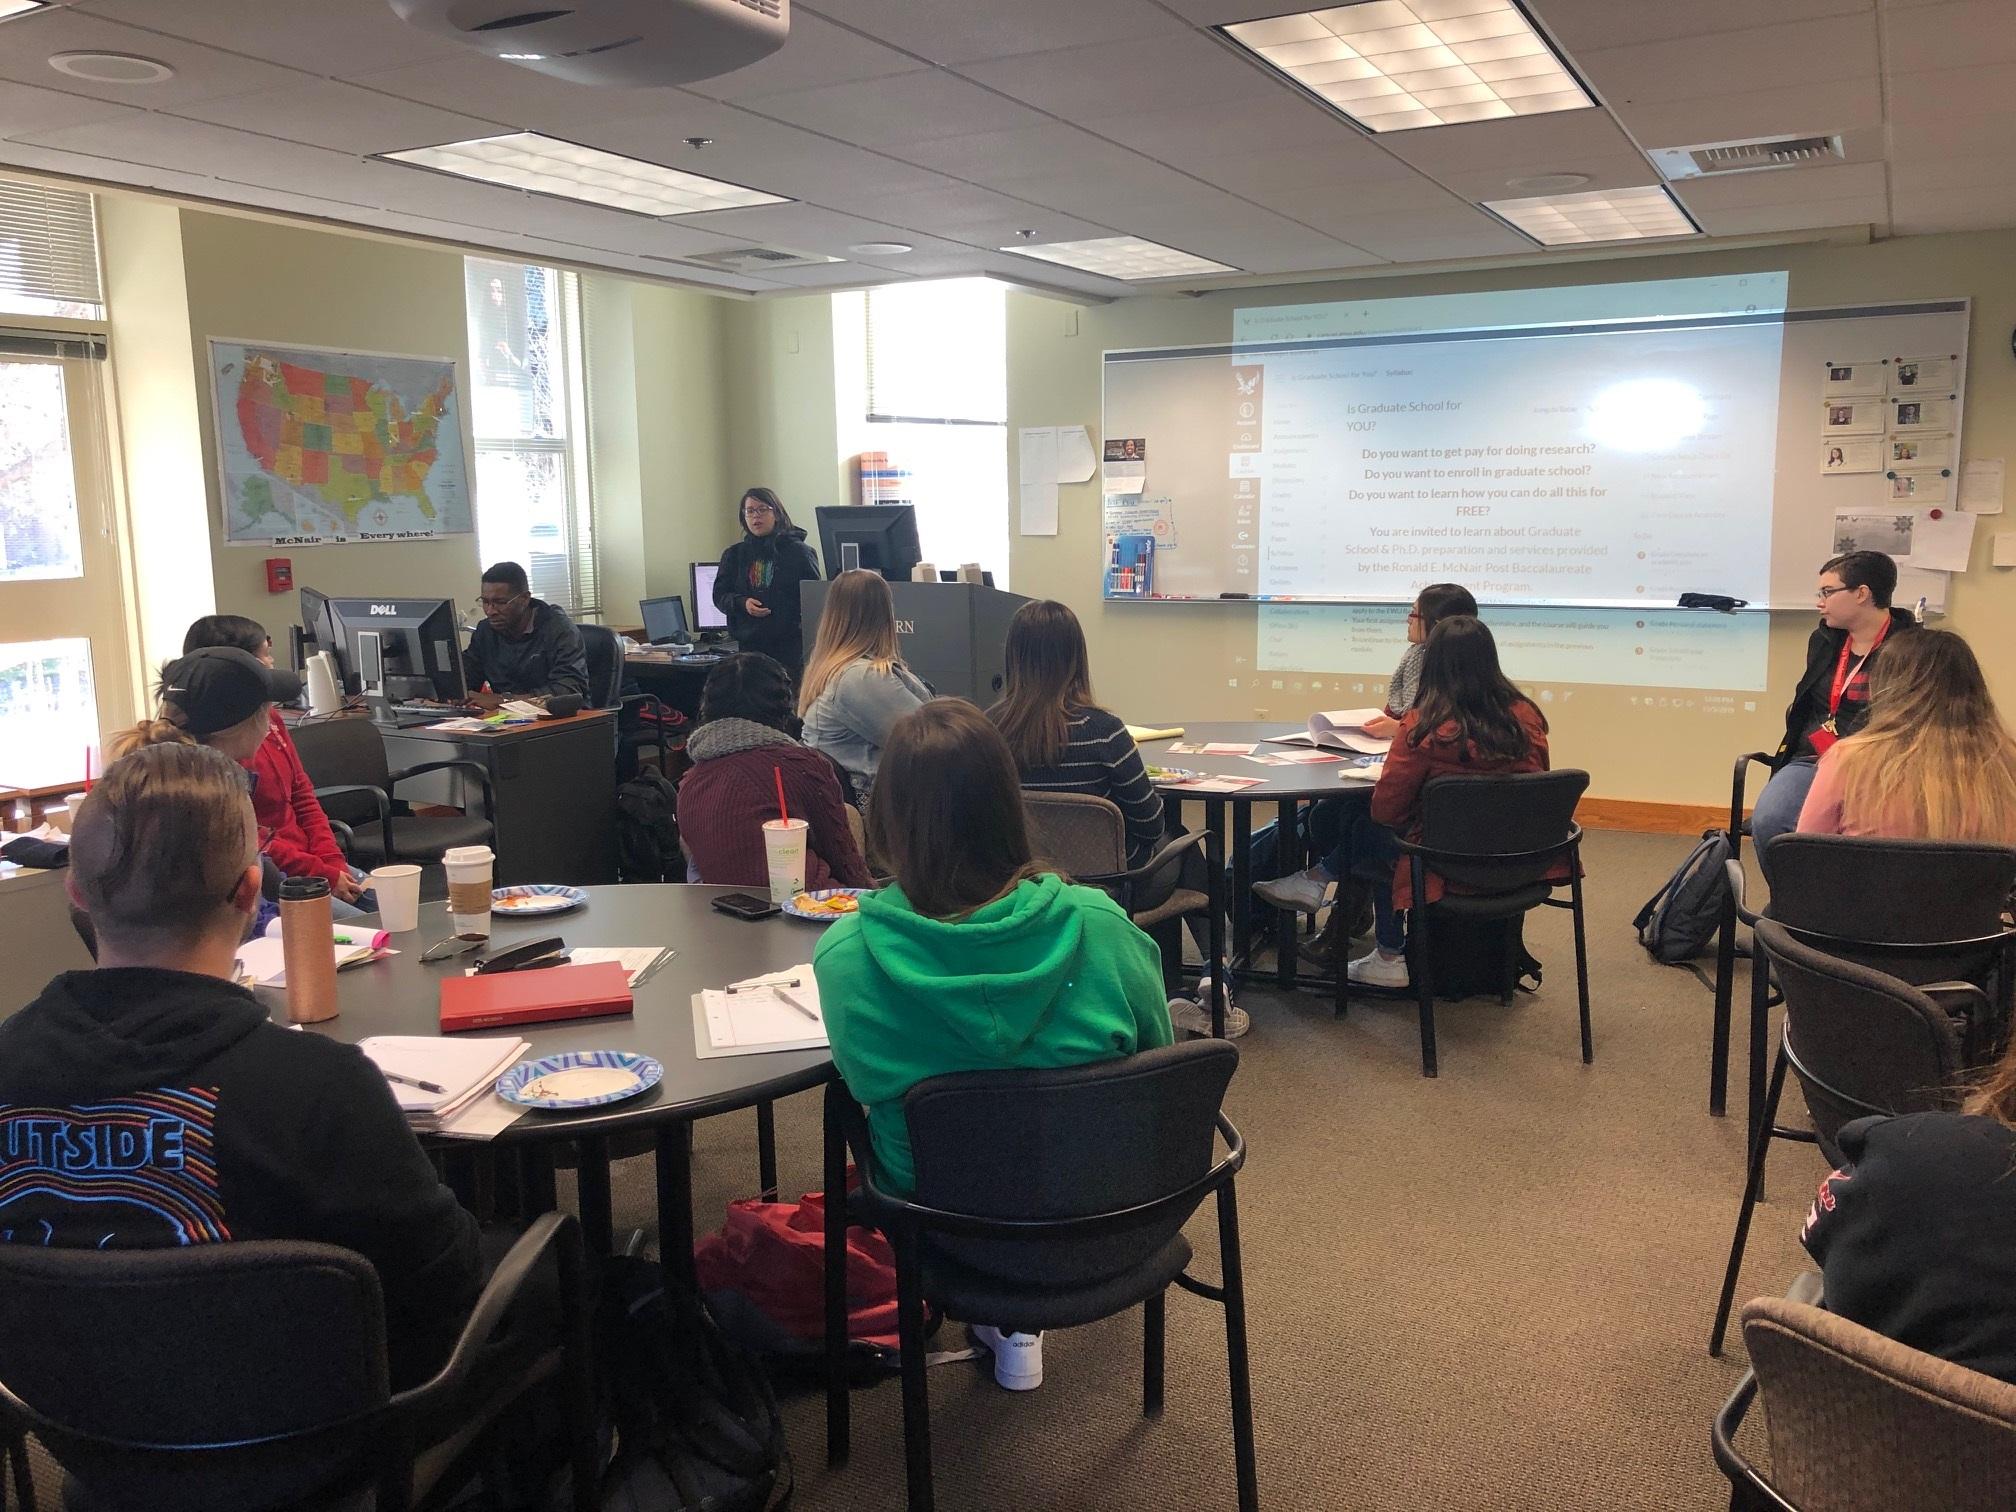 EWU McNair Scholar Marixza Torres Tells Students at EWU McNair Fall Orientation what the program does for students.